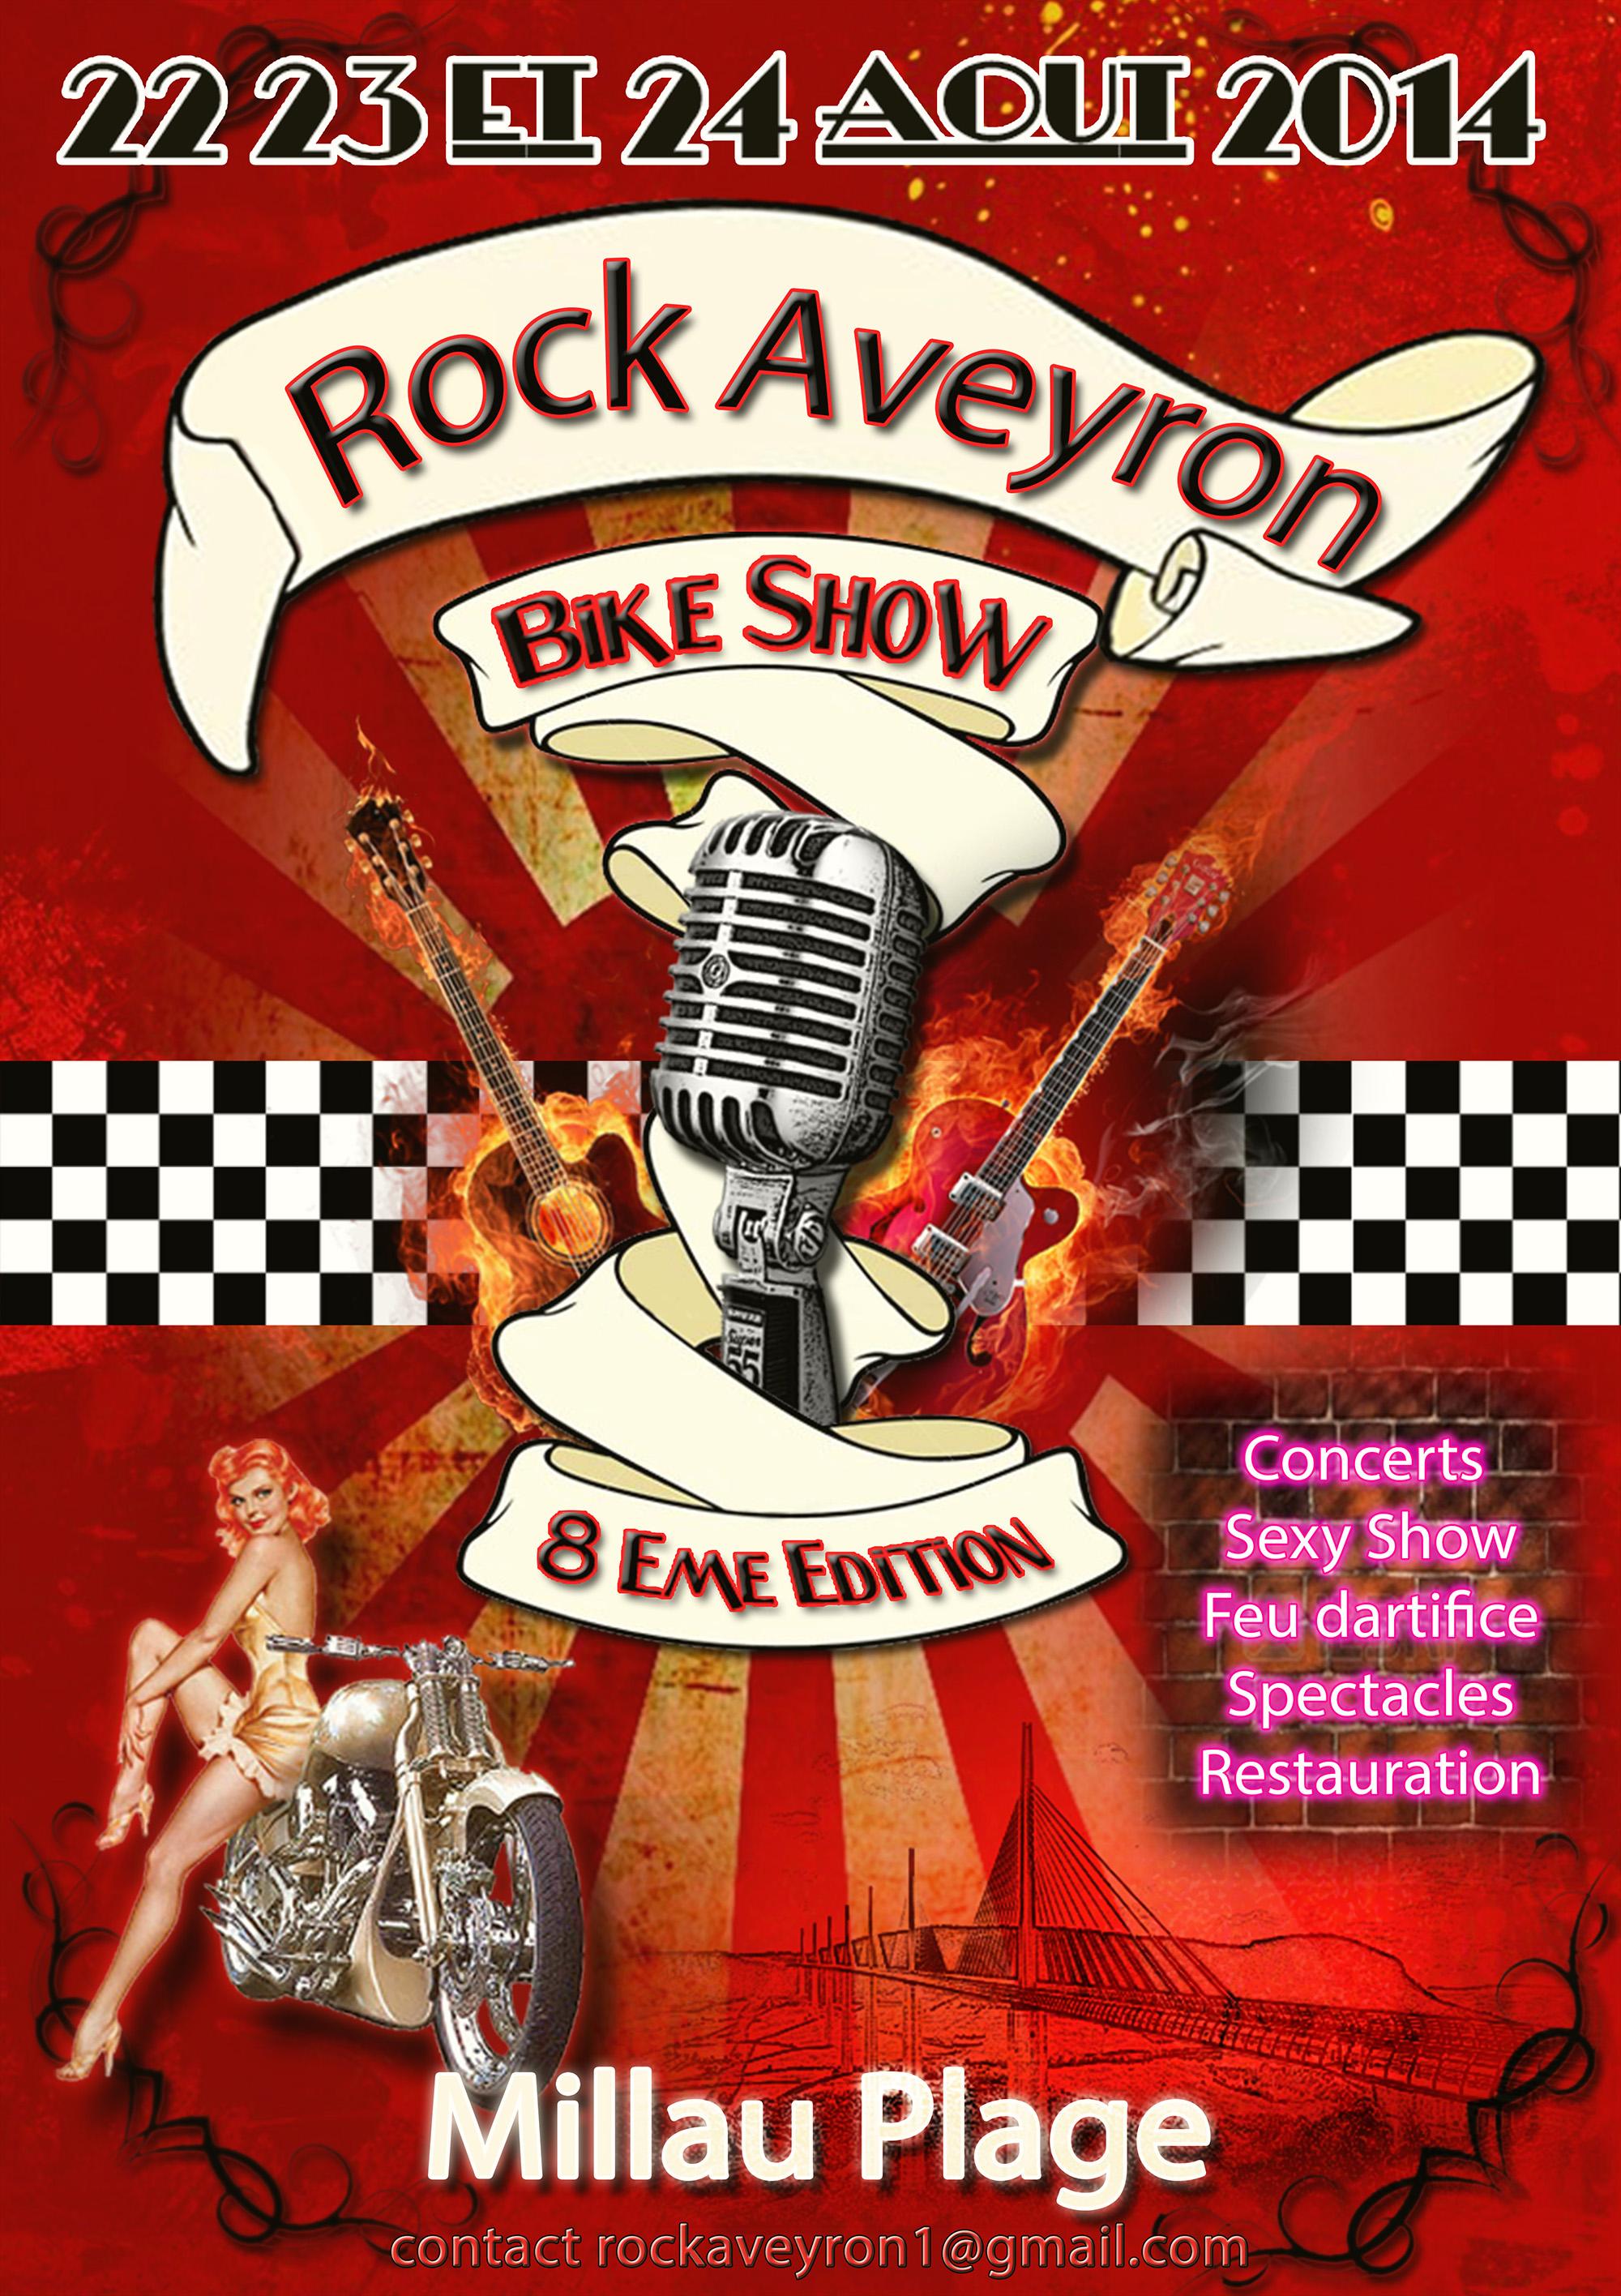 Rock Aveyron Bike Show 22-23-24/08/2014 954457affiche1